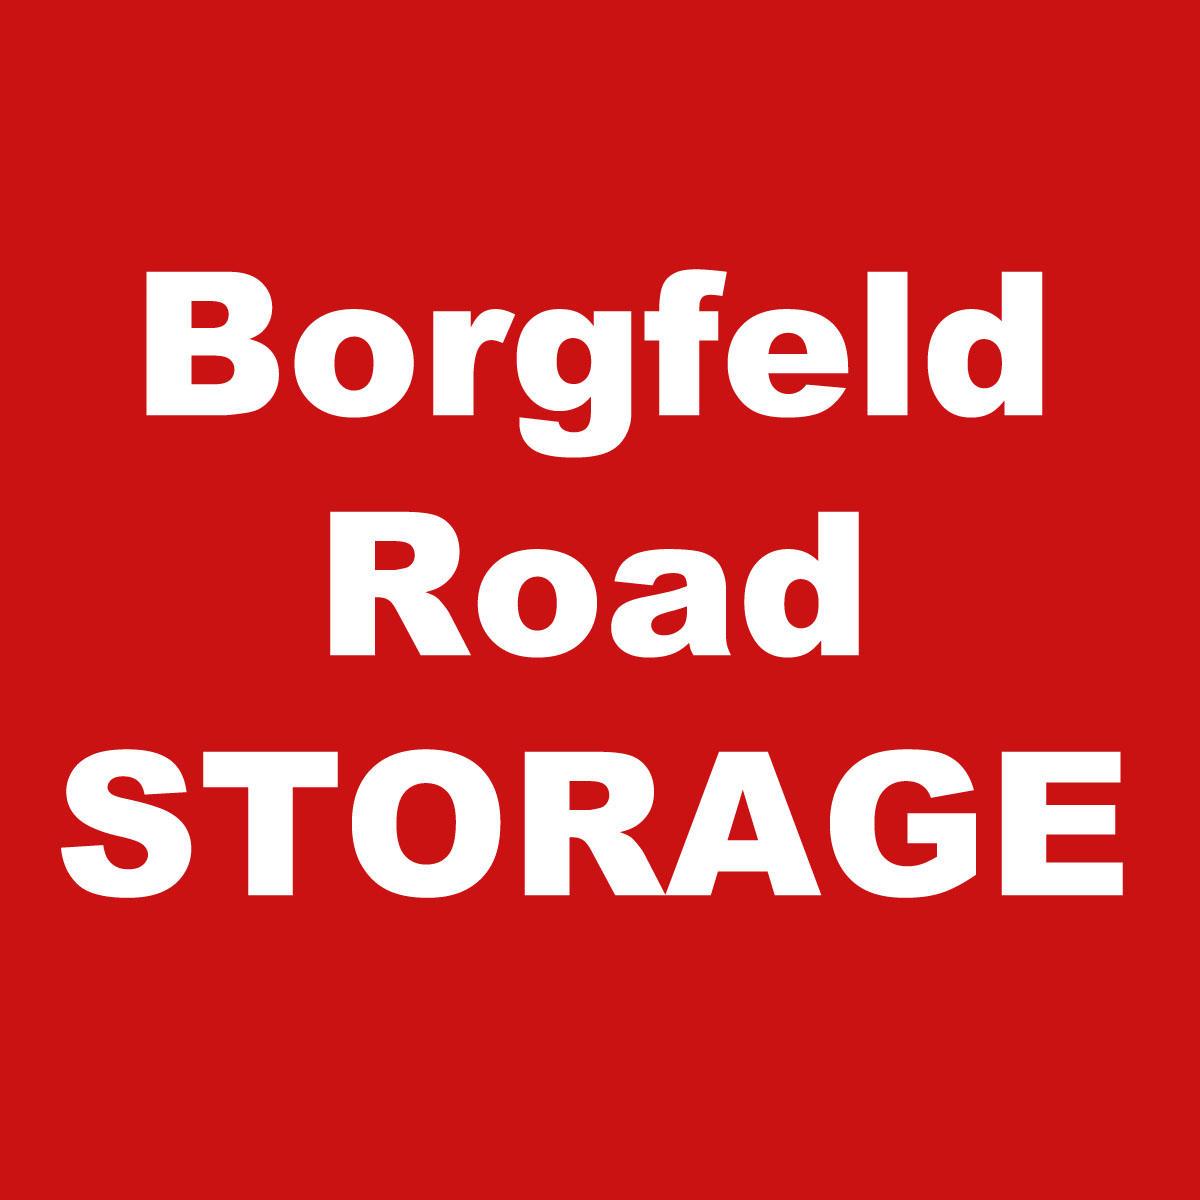 Borgfeld Road Storage